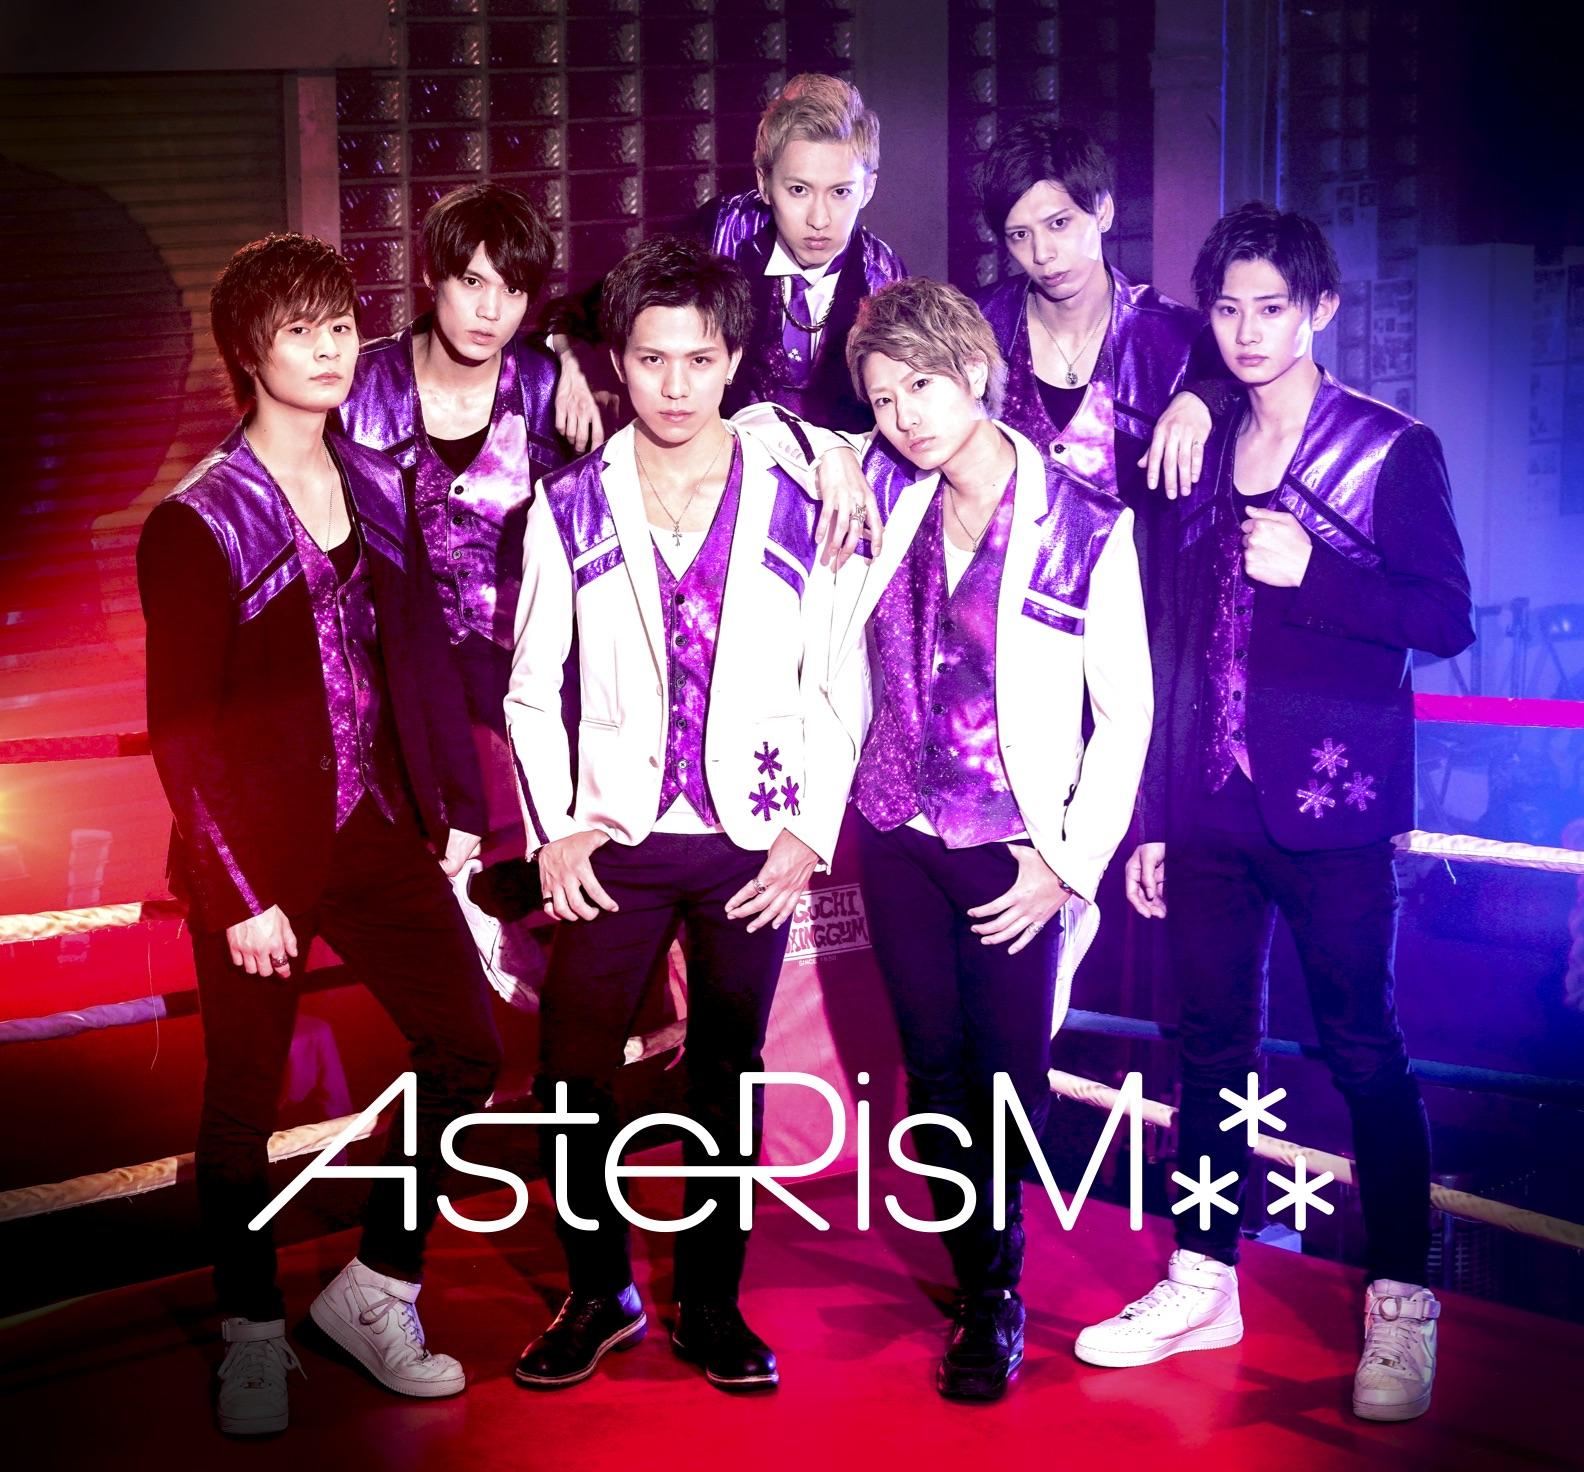 12/4 AsteRisM⁂ワンマンライブ -AsteISM-